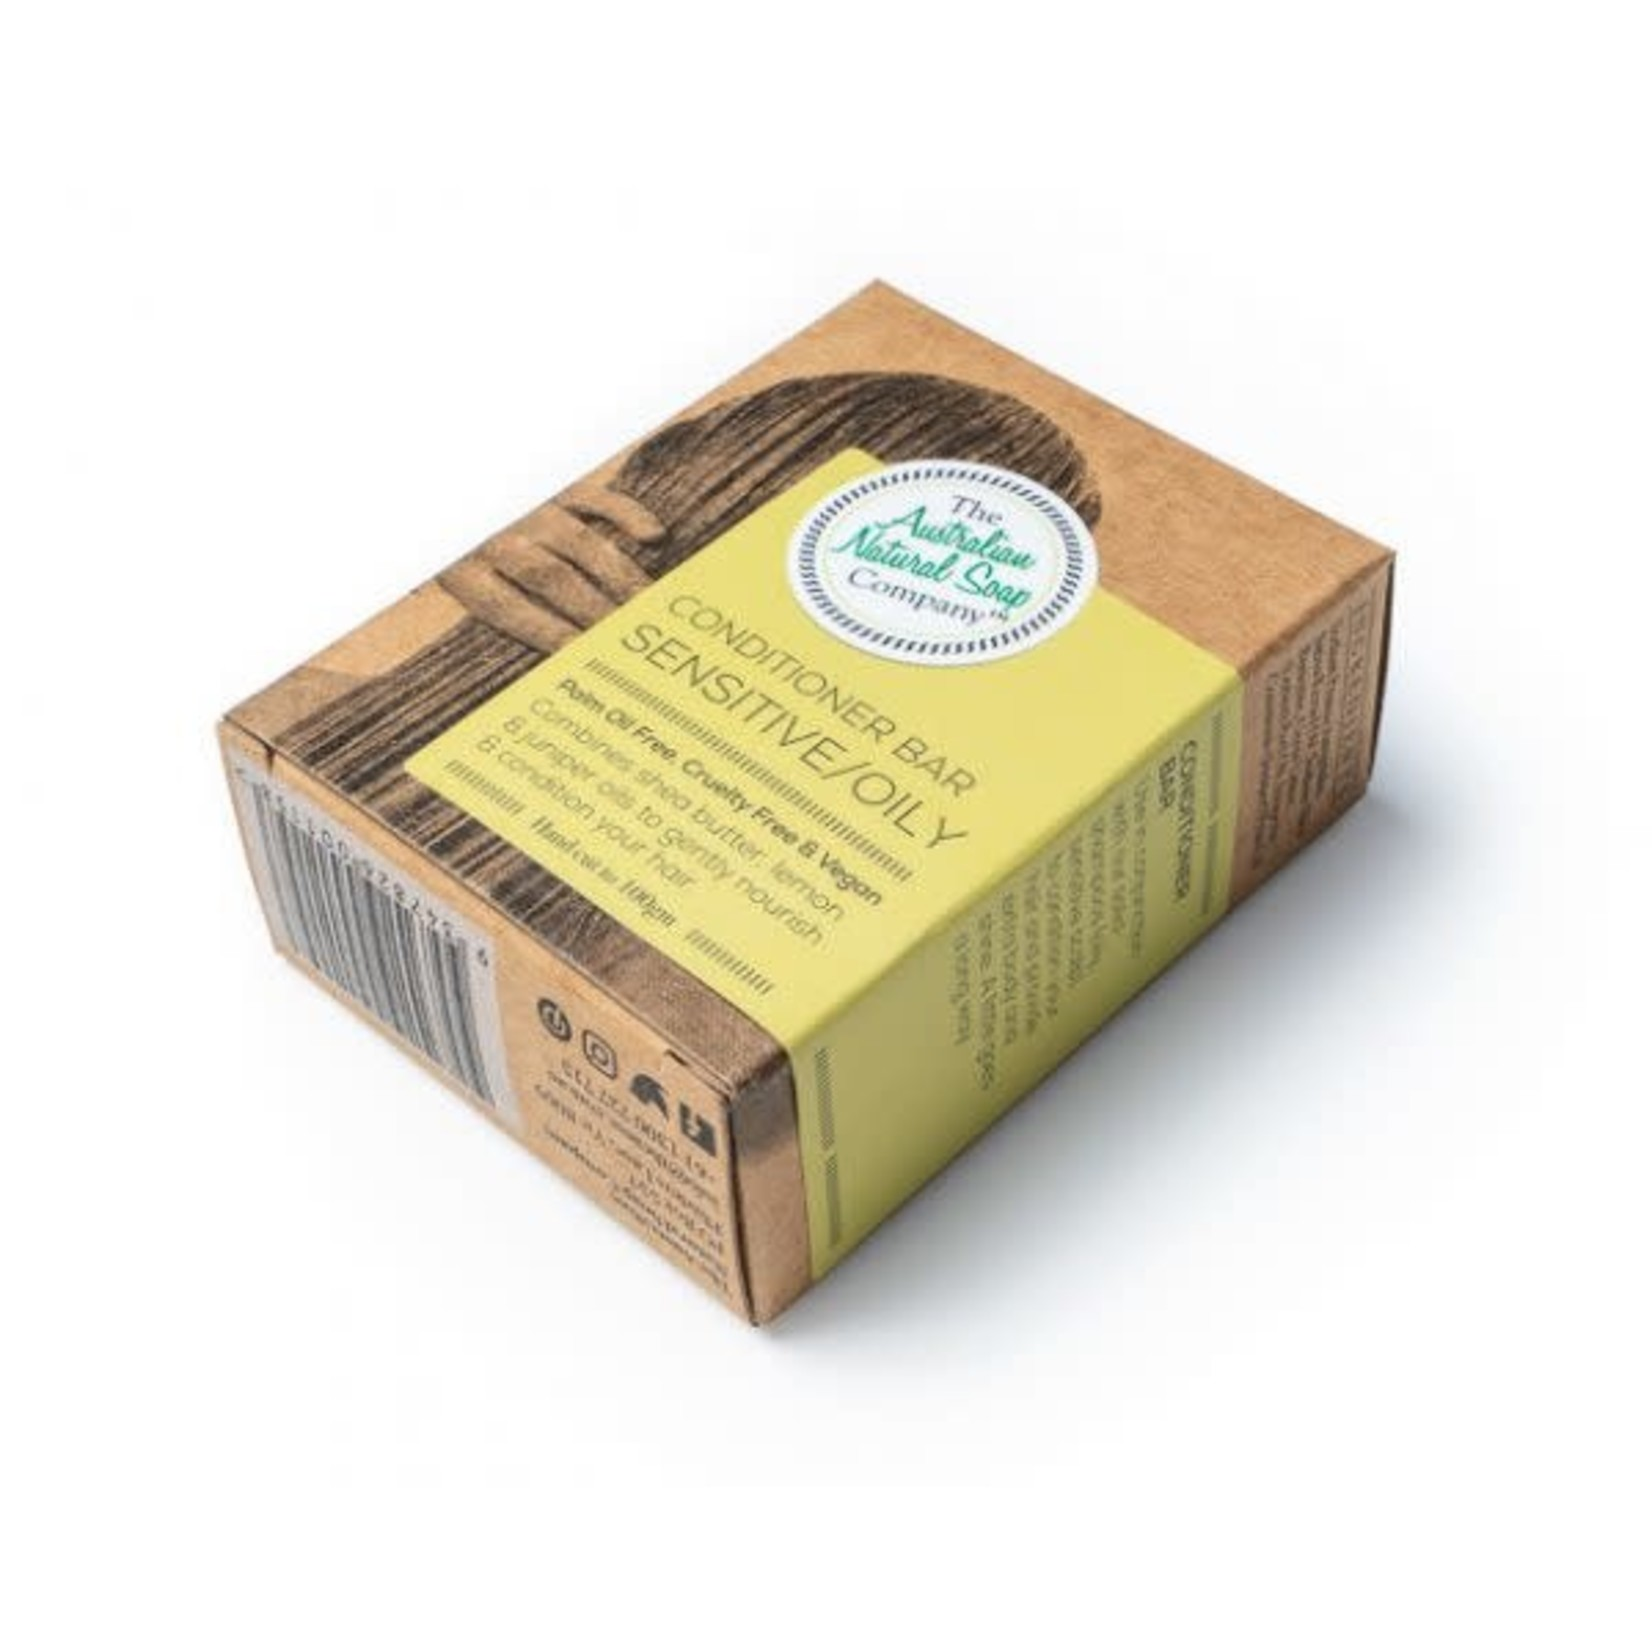 The Australian Natural Soap Company The Australian Natural Soap Company Conditional Bar Sensitive/Oily